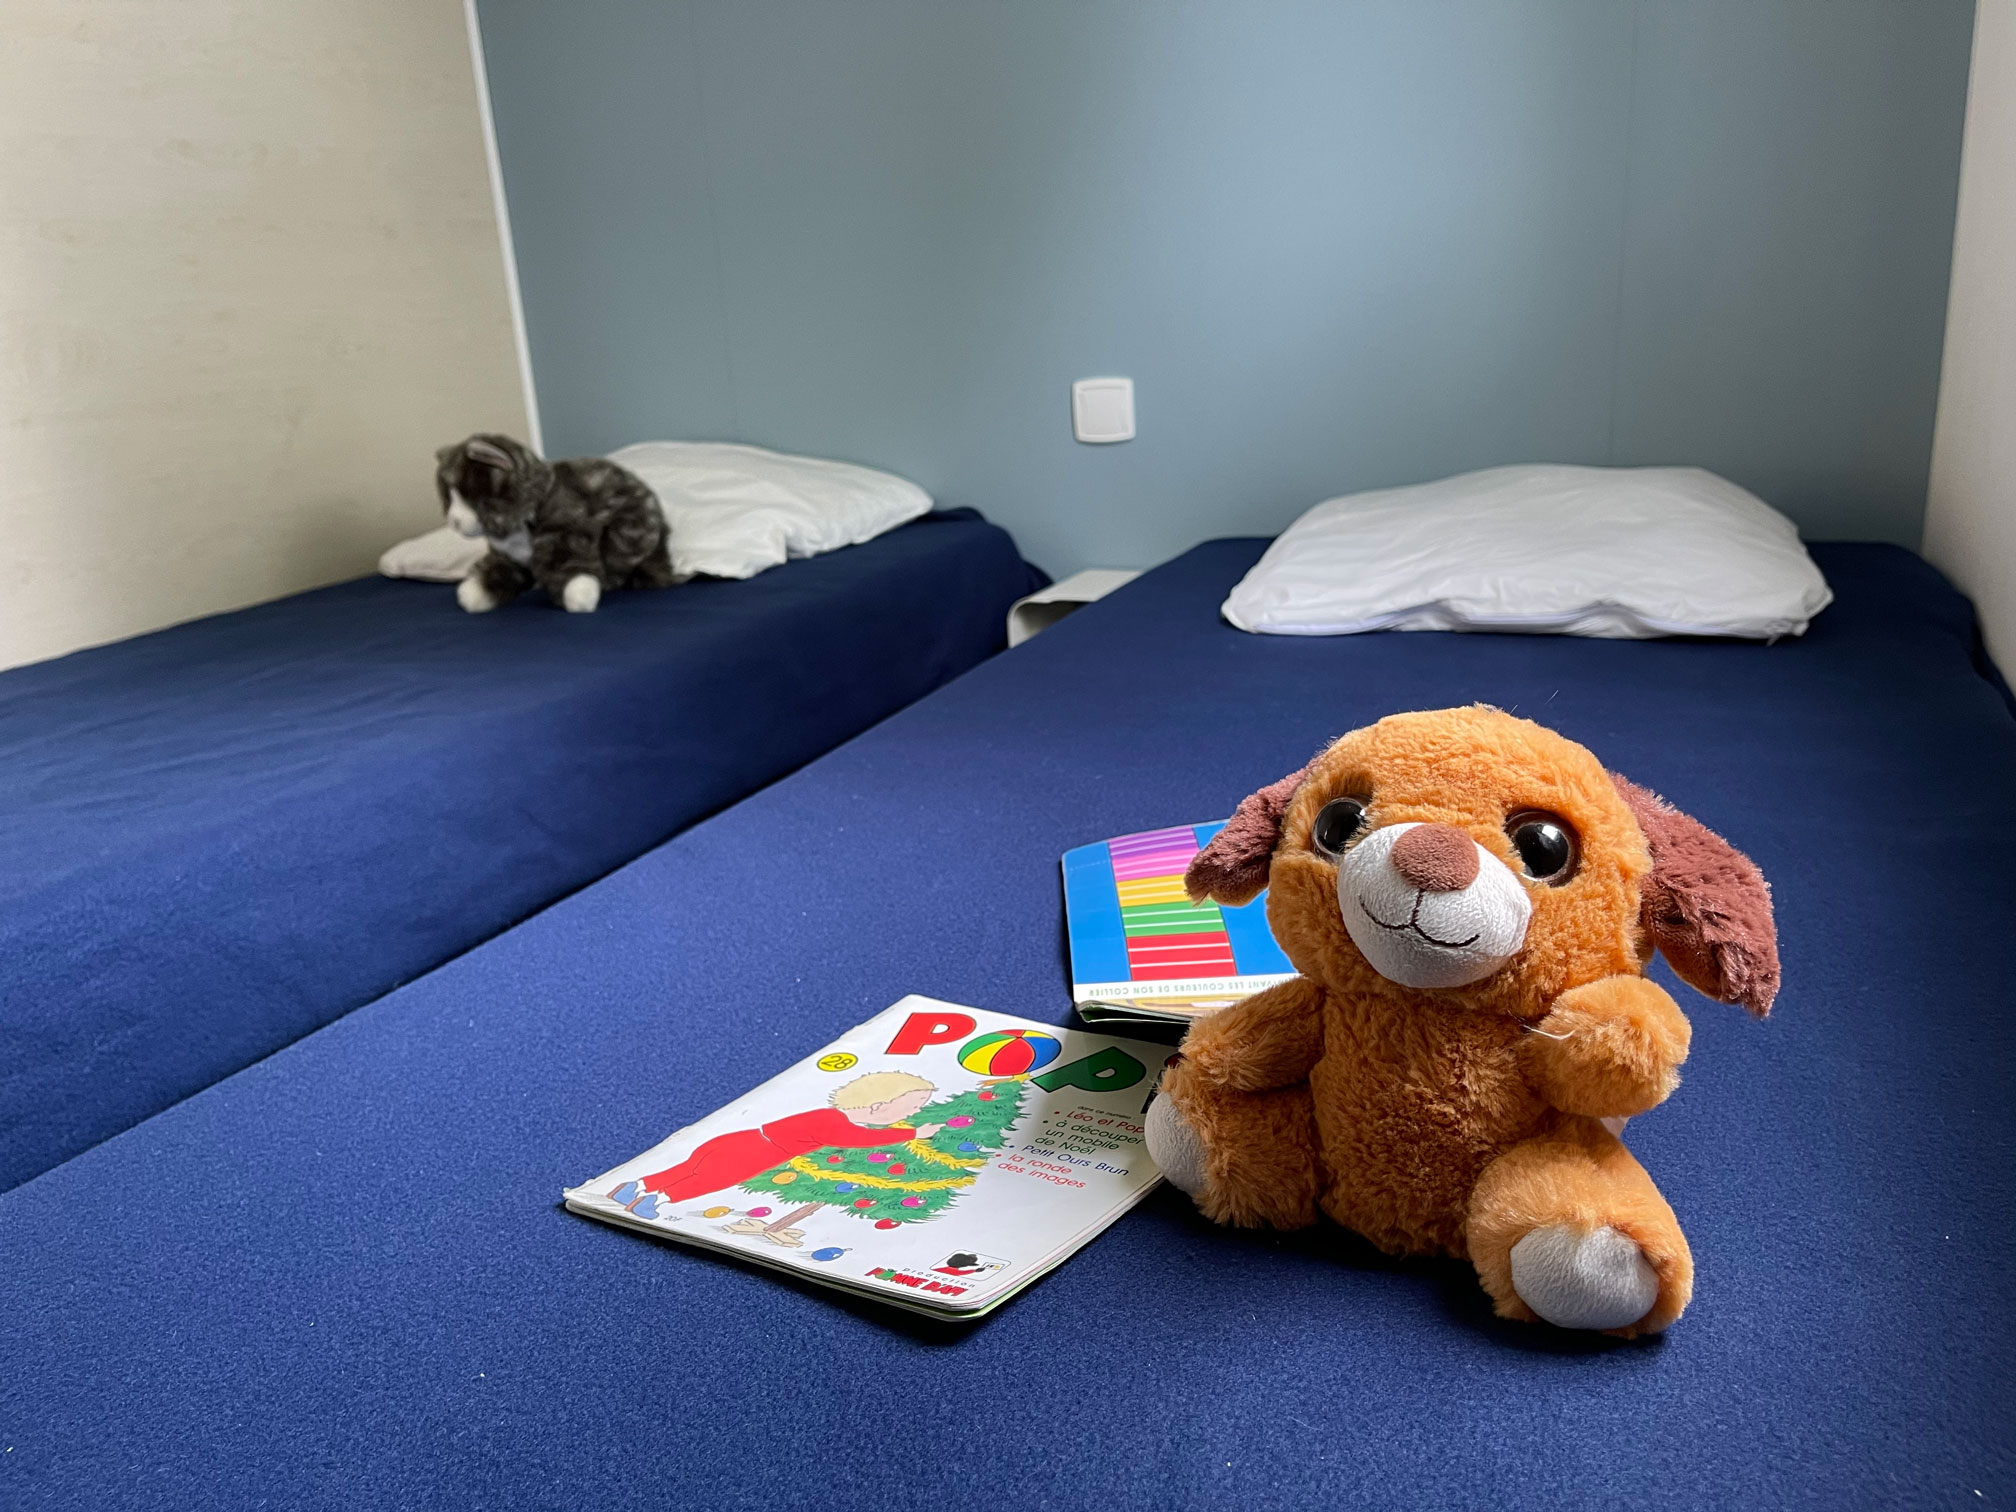 galerie-location-mobil-home-4-6-personnes-prestige-chambre-enfants-camping-moricq